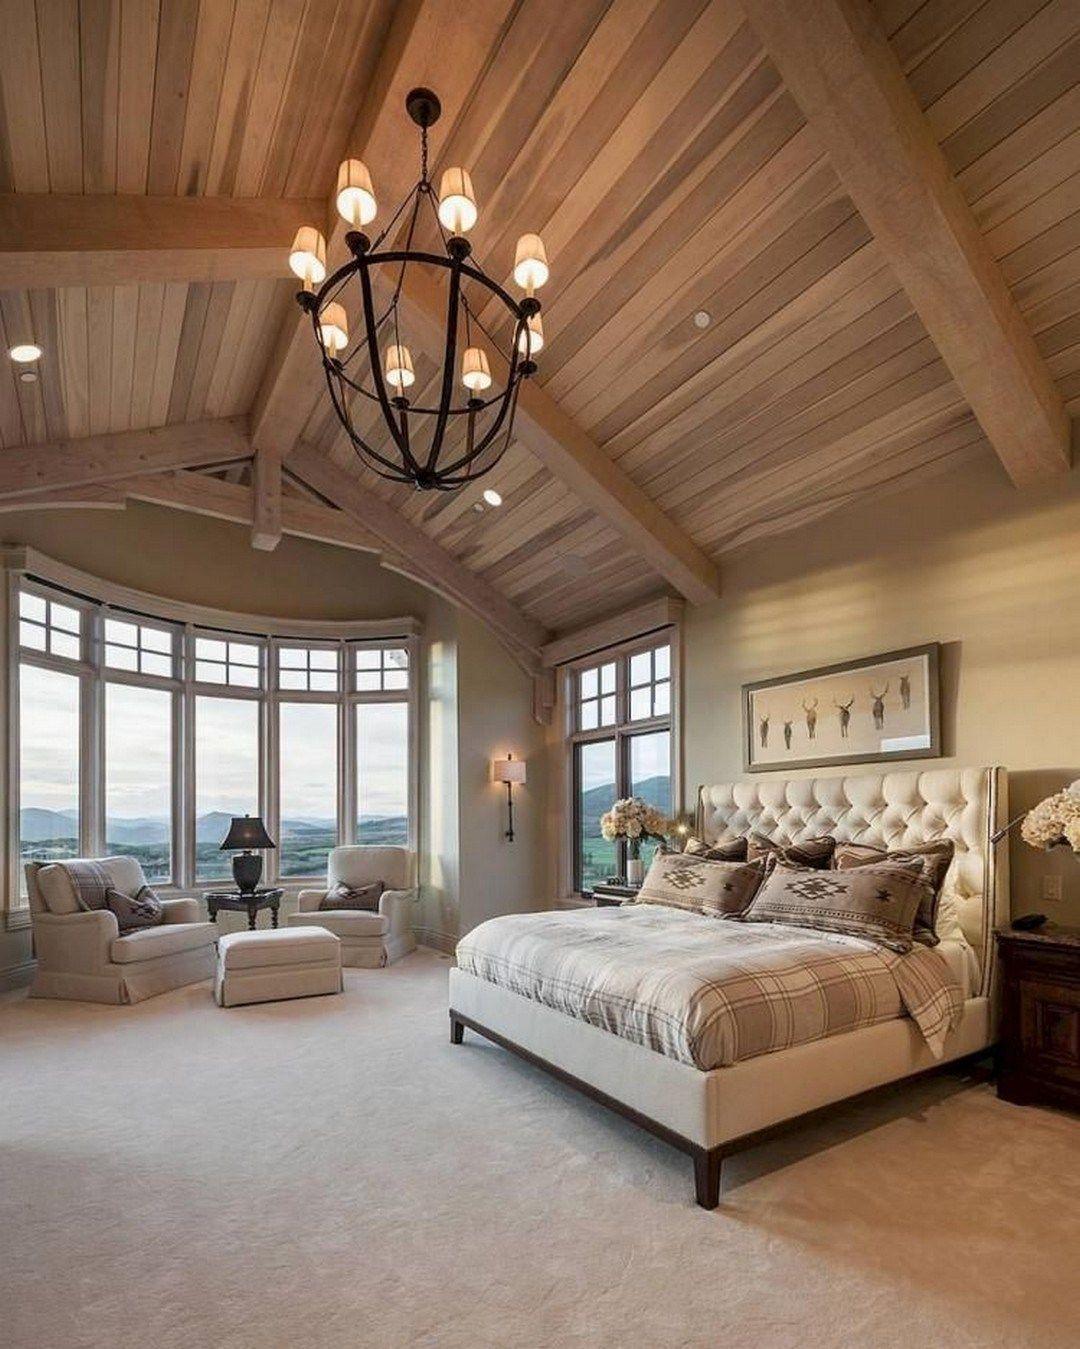 beautiful rustic coastal farmhouse style 14 in 2020 on romantic trend master bedroom ideas id=64046